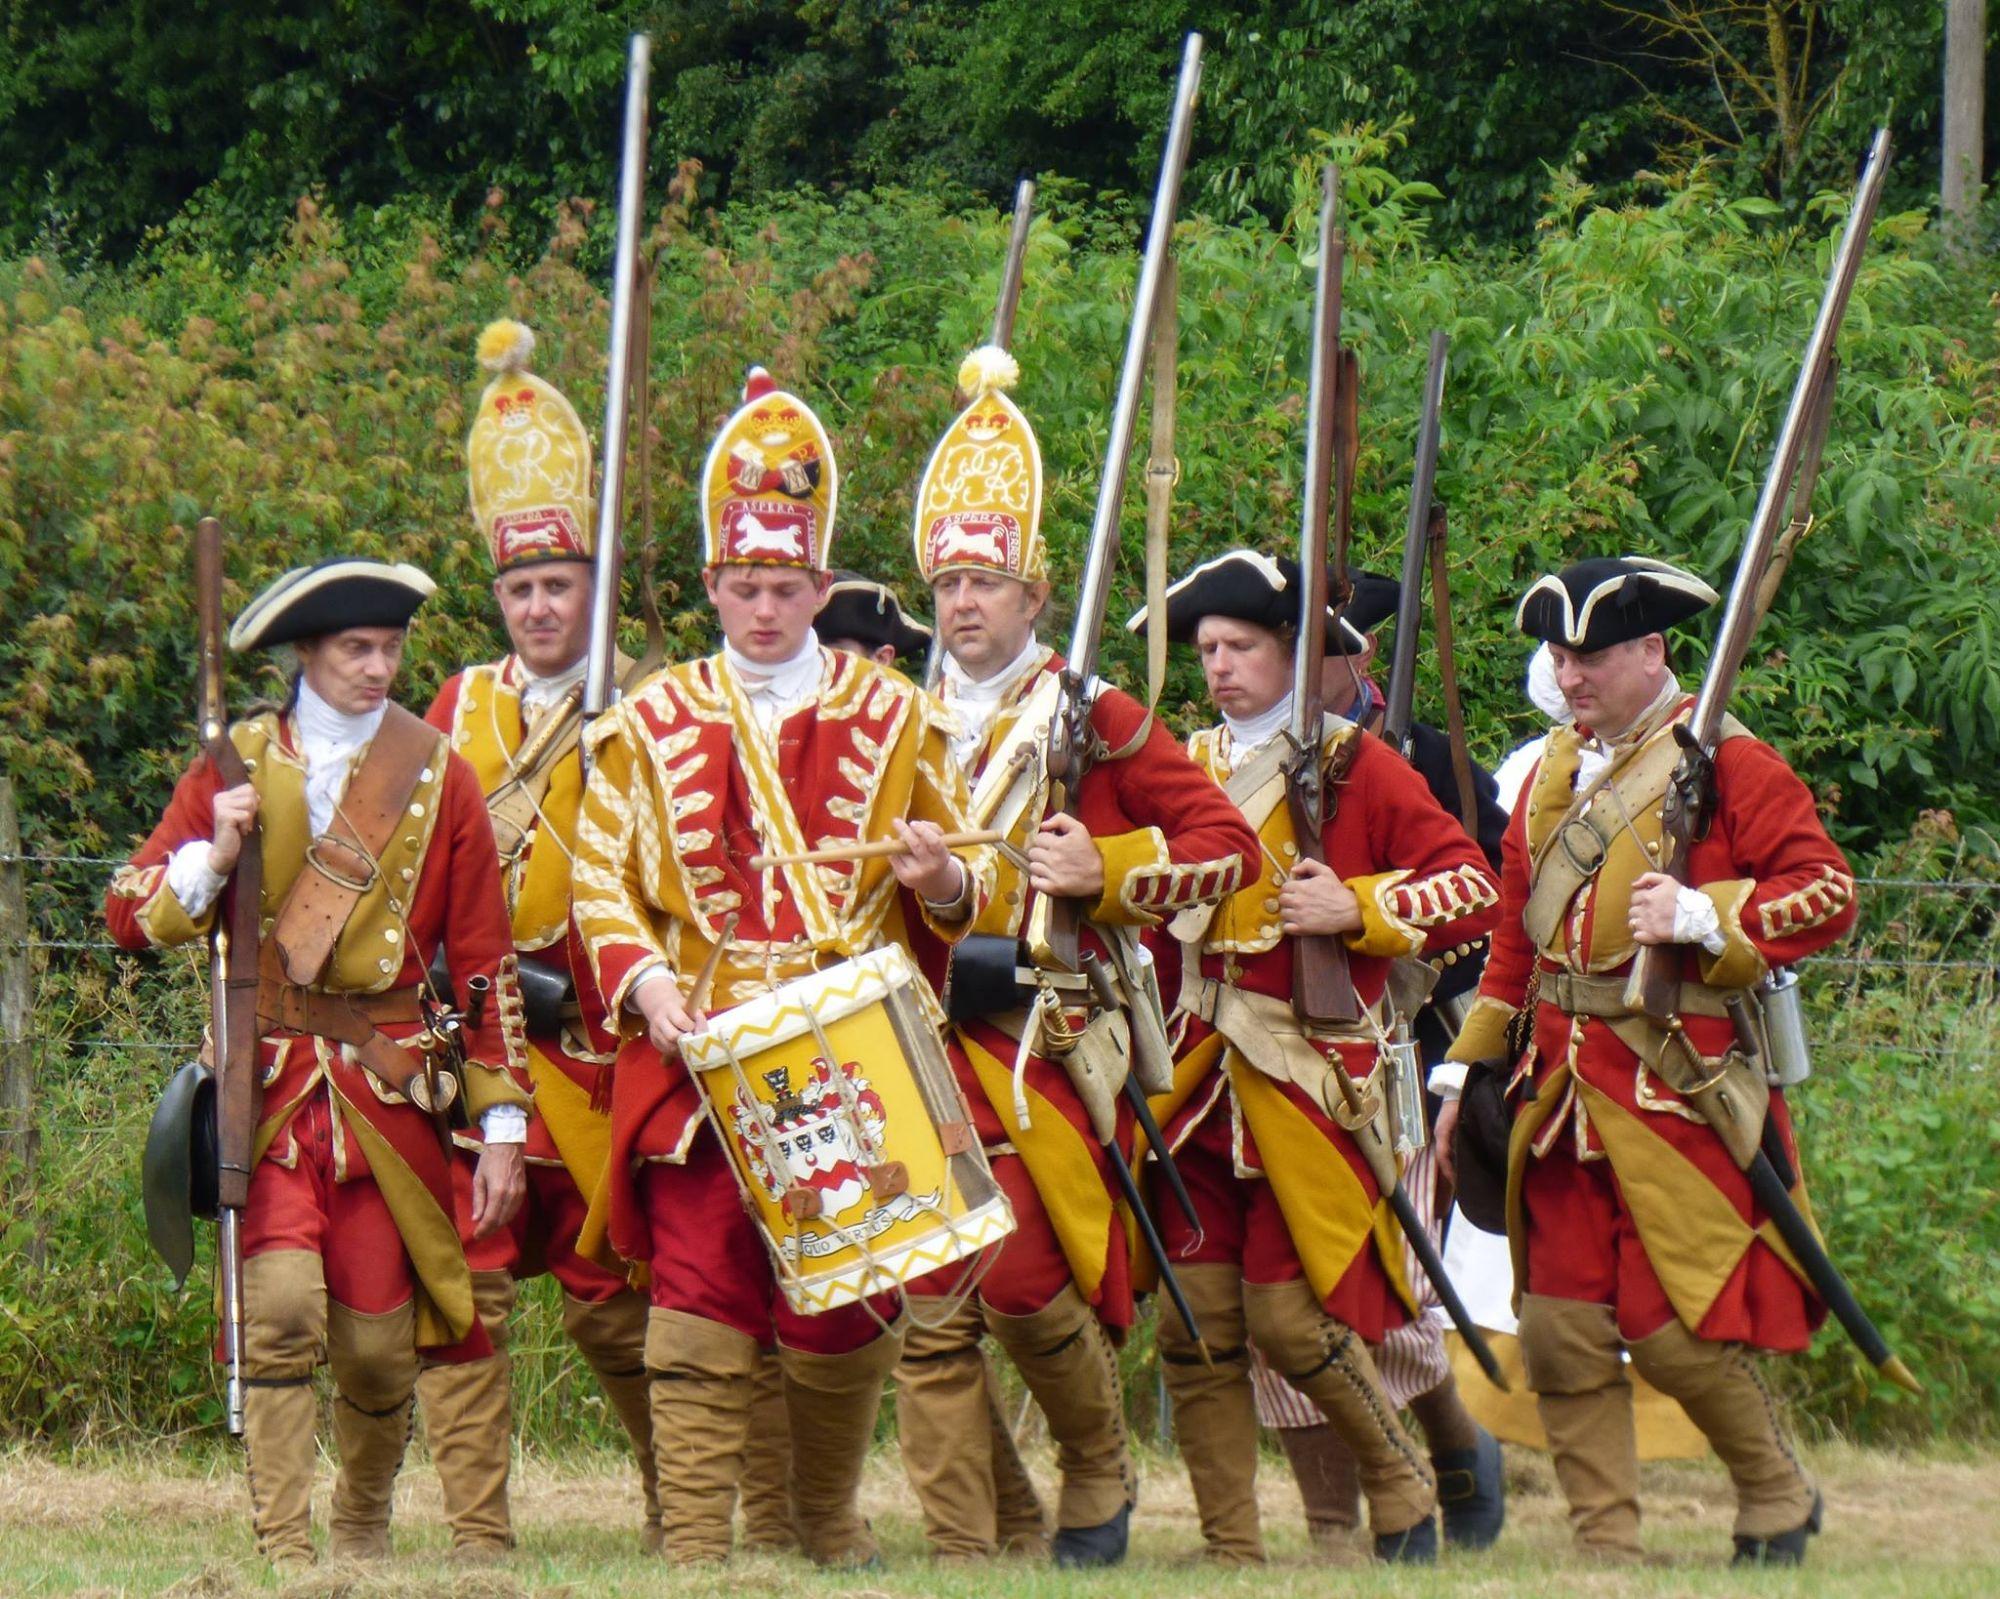 Midland History Festival